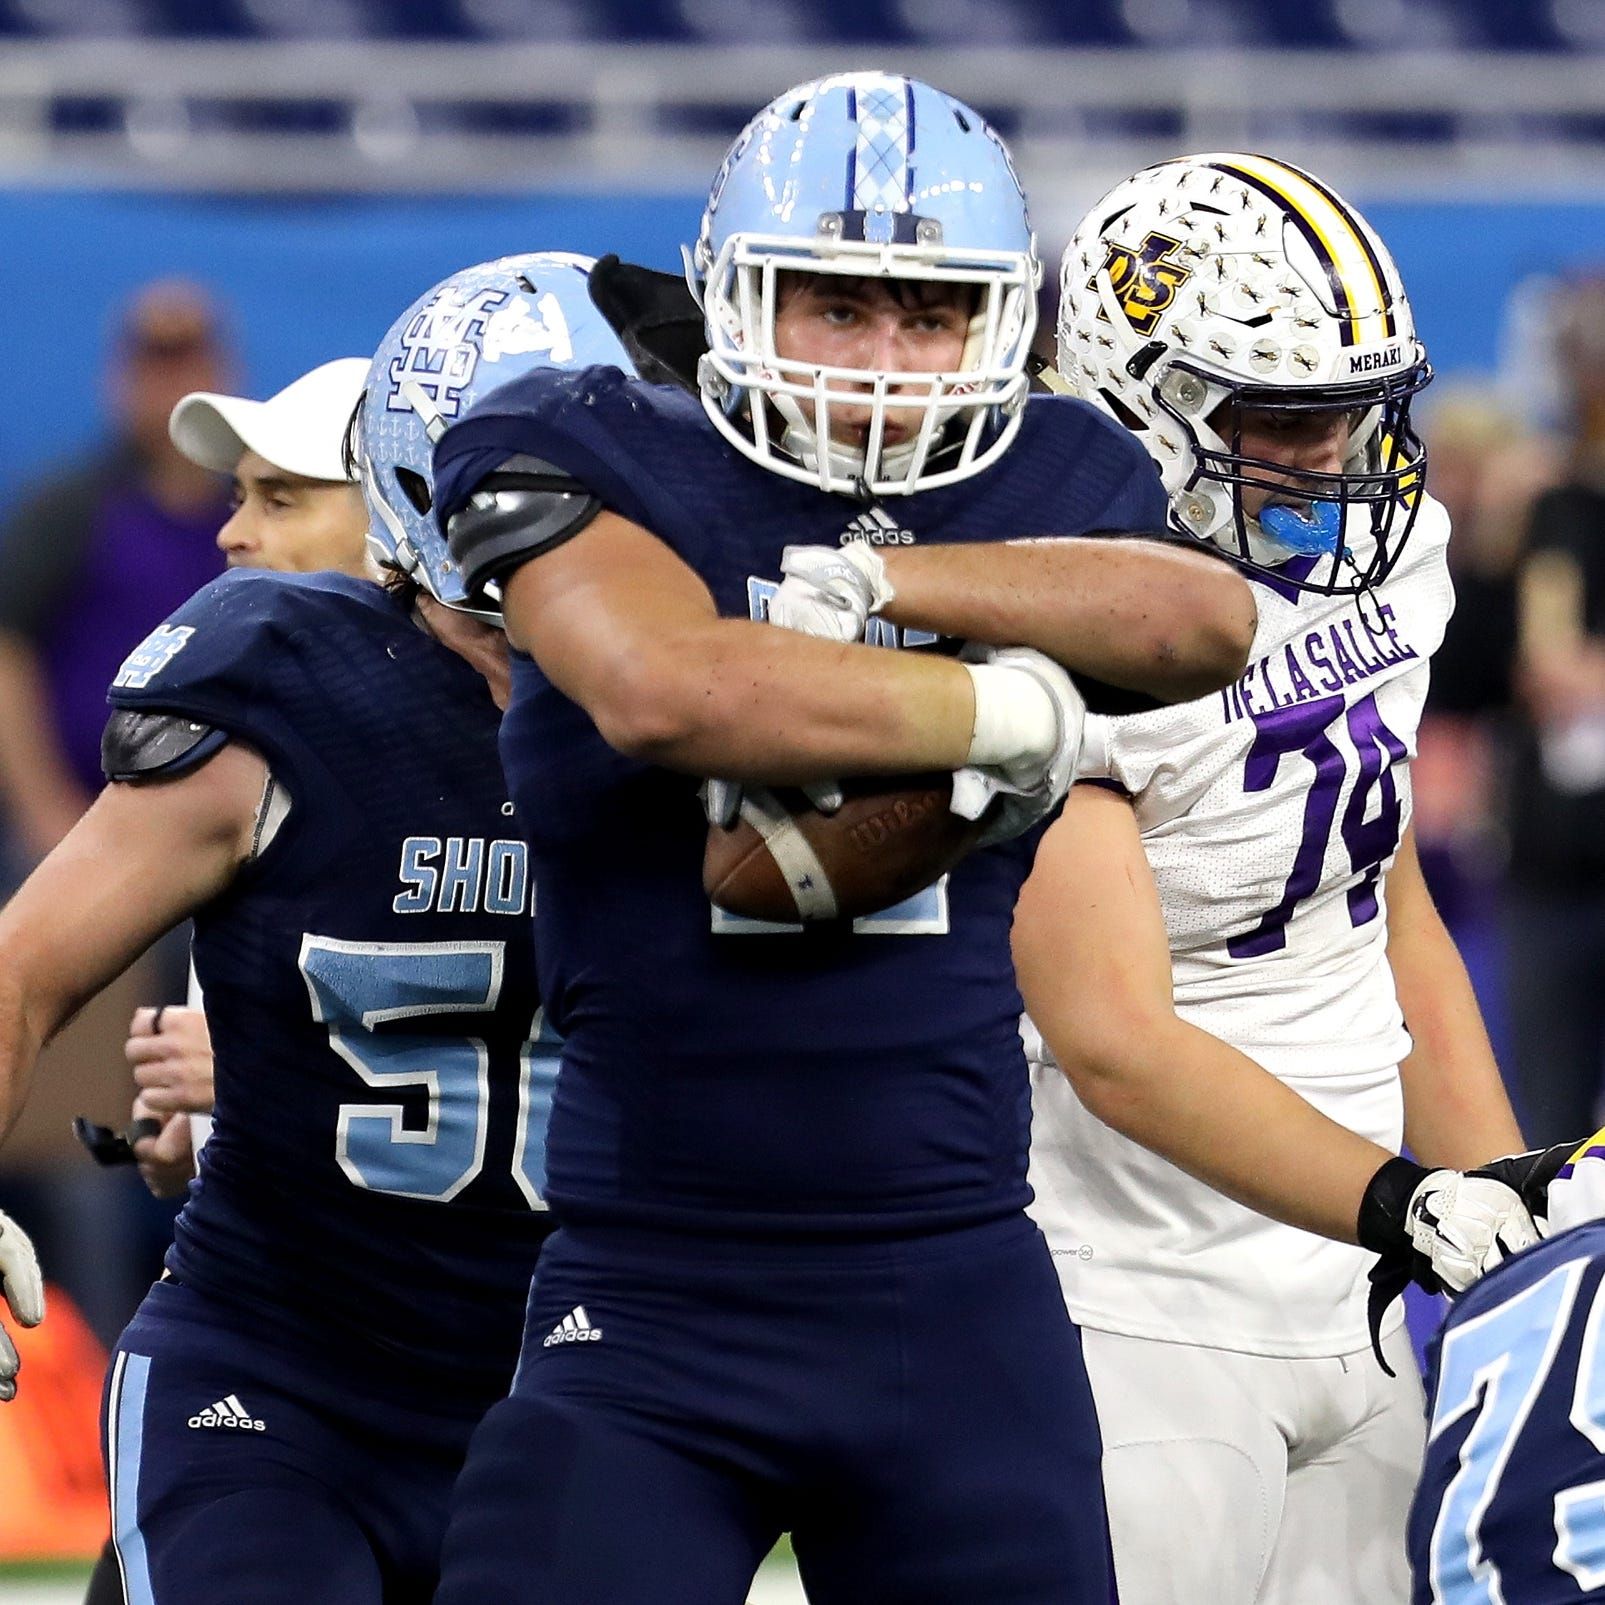 Purdue football adds linebacker to 2019 recruiting class